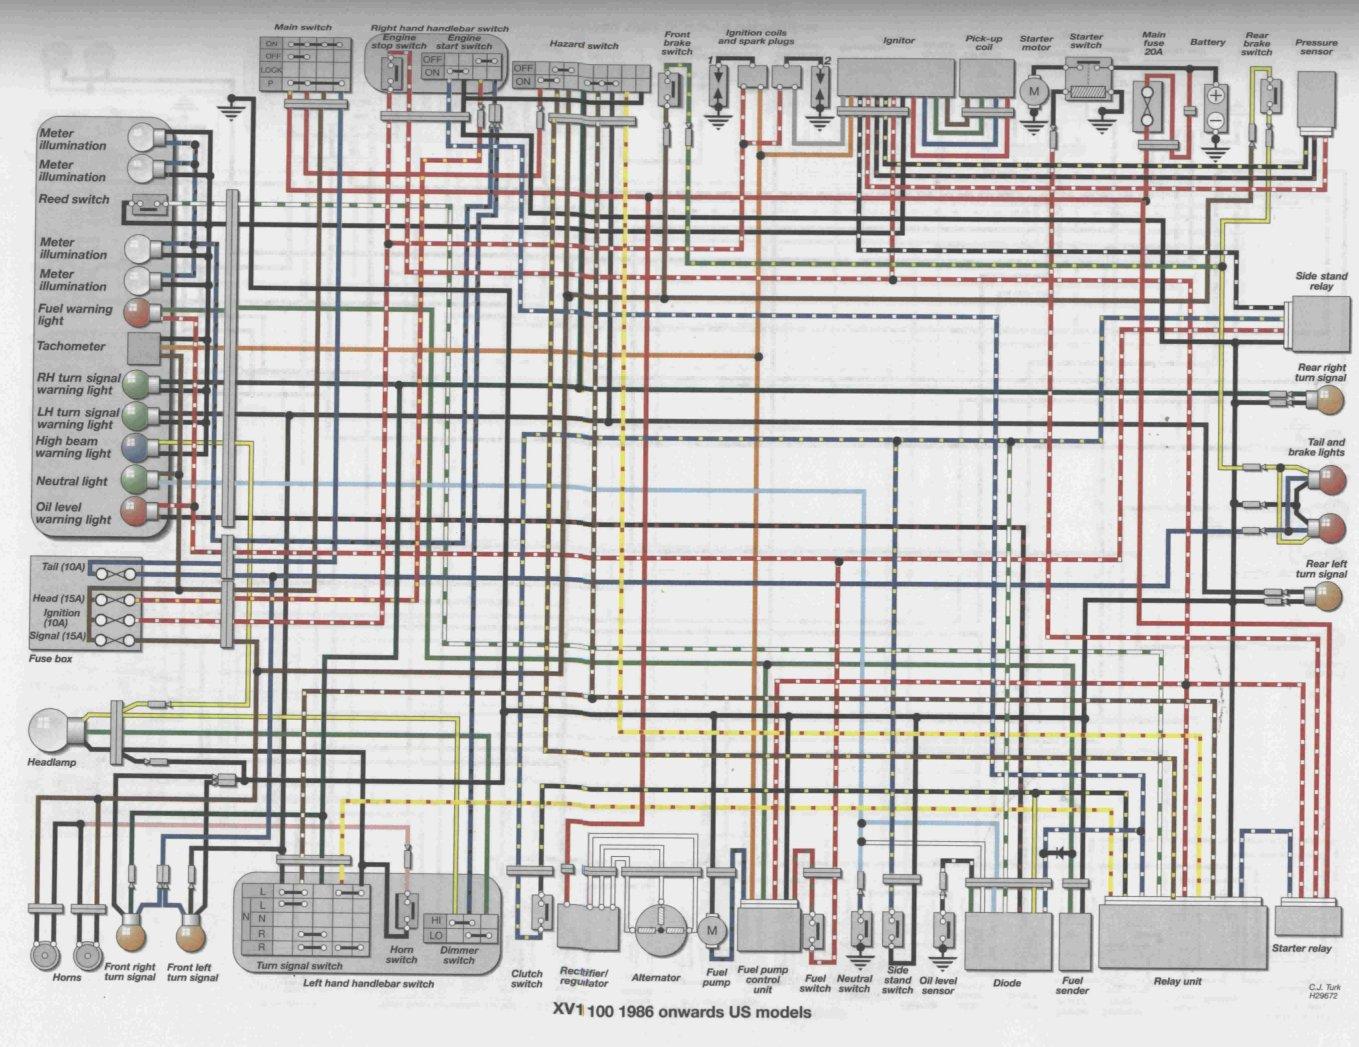 DB_7951] Diagram Additionally Yamaha Virago 250 Fuel Pump Diagram On Yamaha  V Download Diagram | 1980 Yamaha 650 Yics Wiring Diagrams |  | Simij Ologi Bepta Mohammedshrine Librar Wiring 101